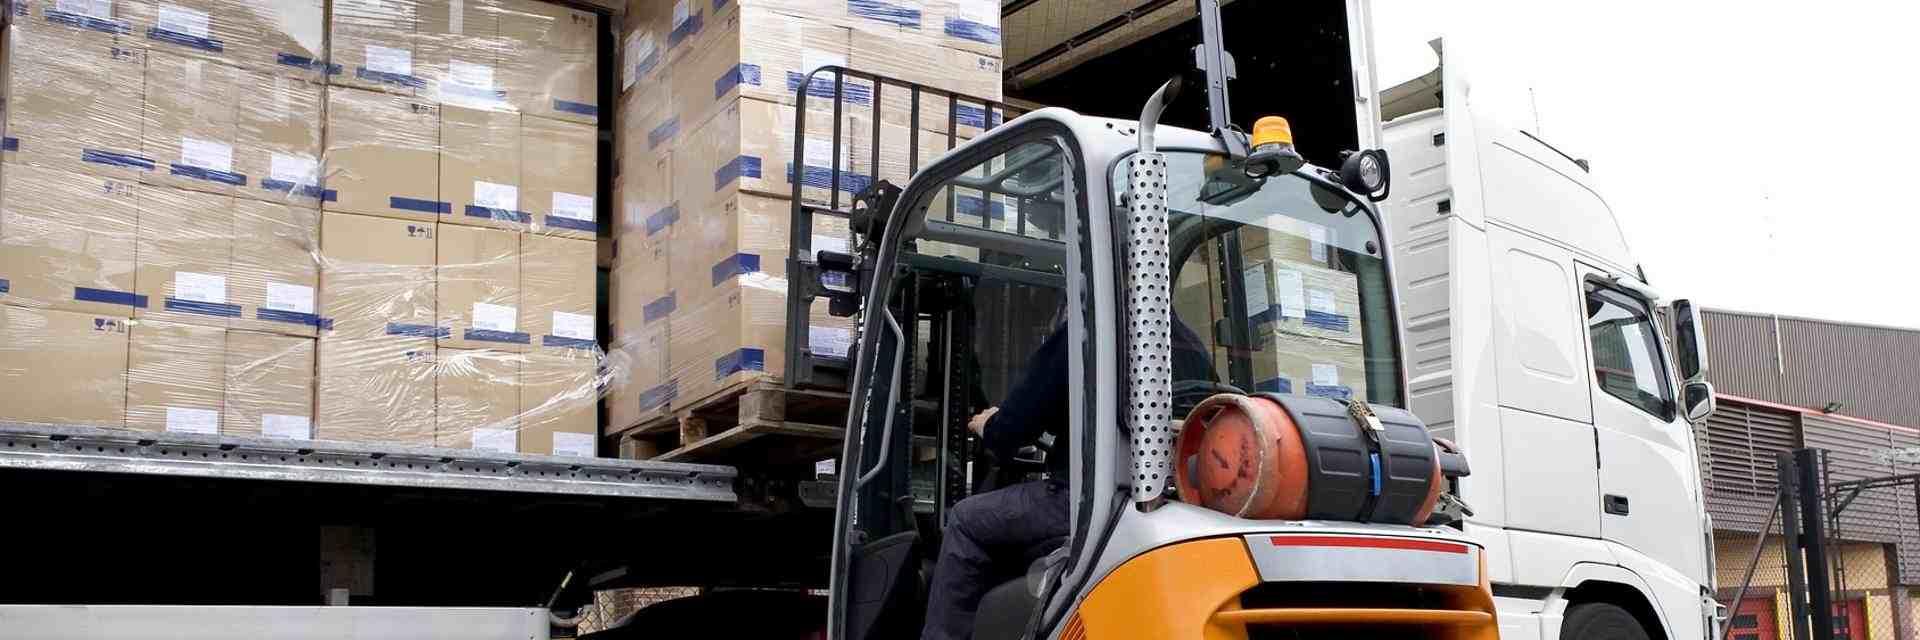 Pallet Delivery Service in Lichfield - Palet Distribution